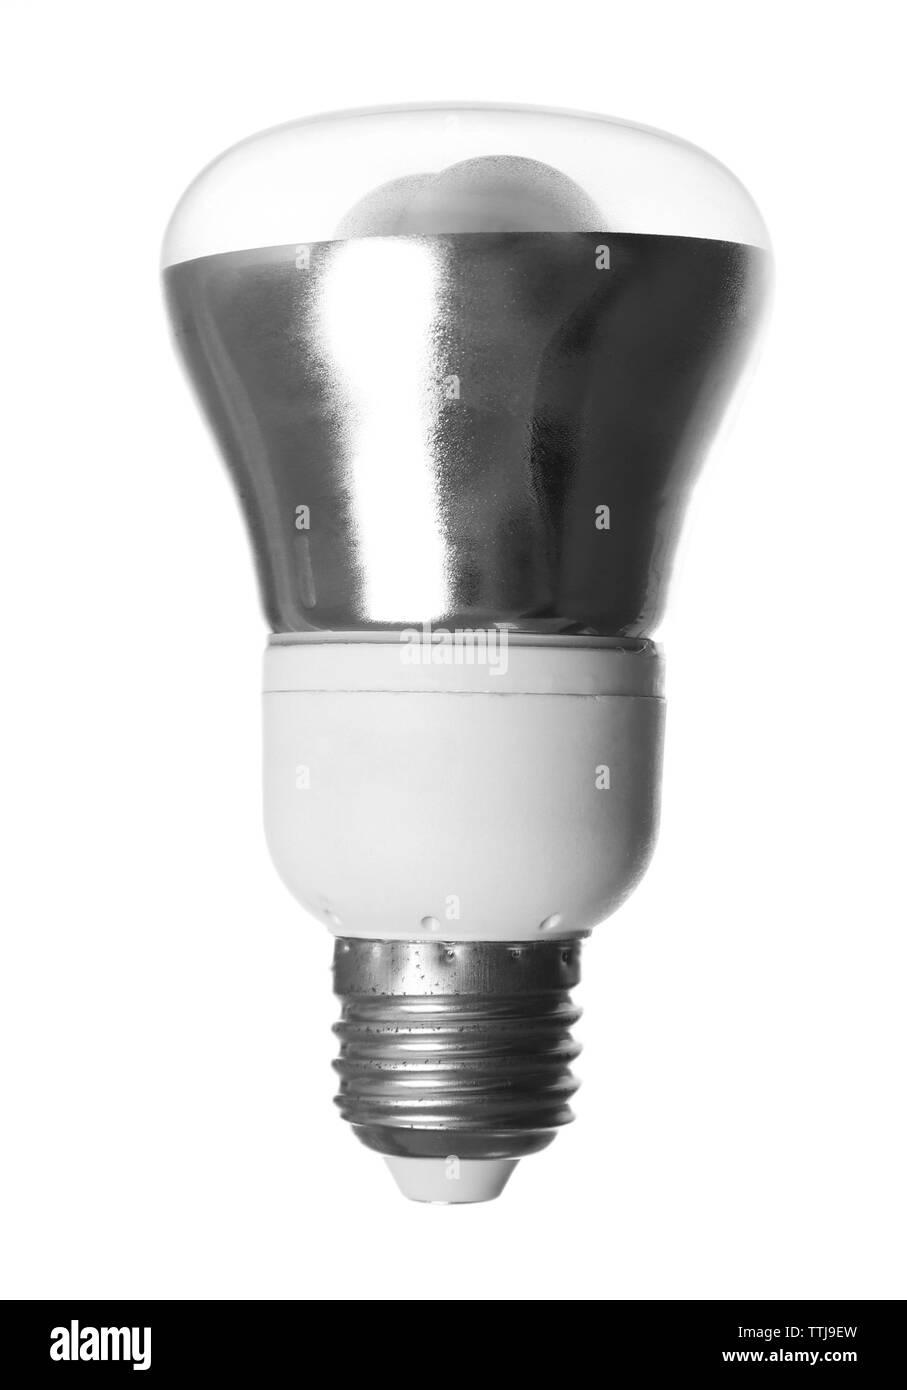 Light bulb on white background - Stock Image